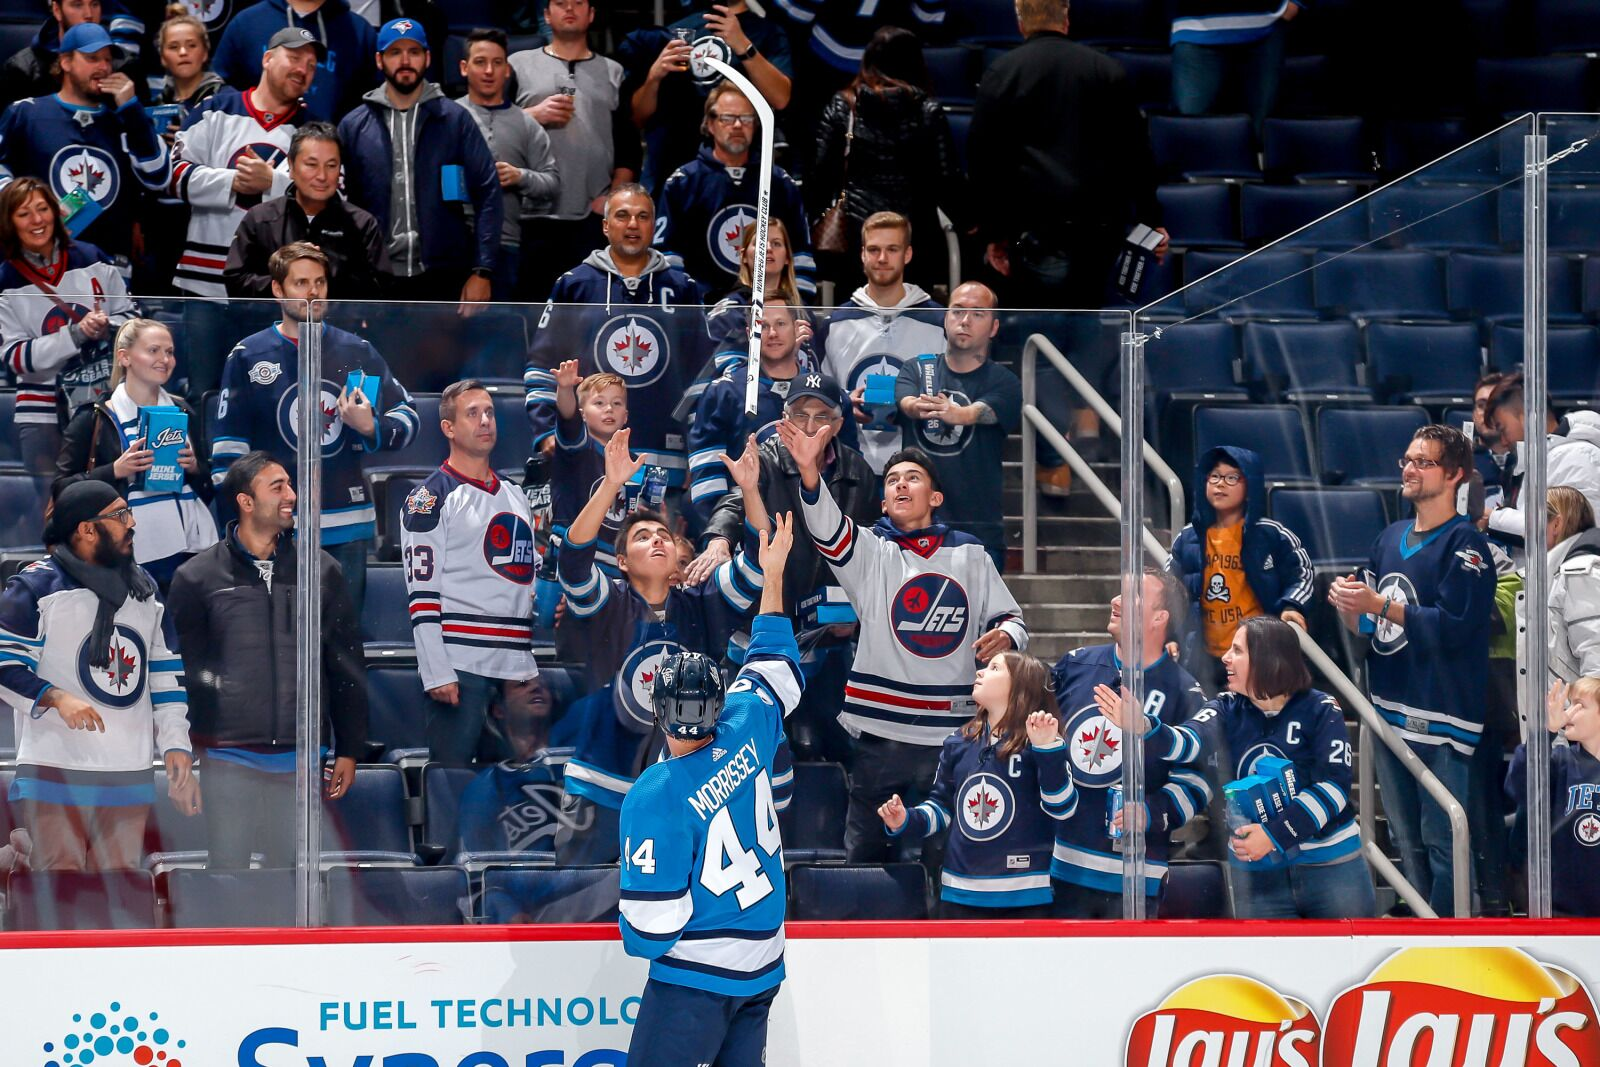 Winnipeg Jets Show Josh Morrissey What They Think of Him